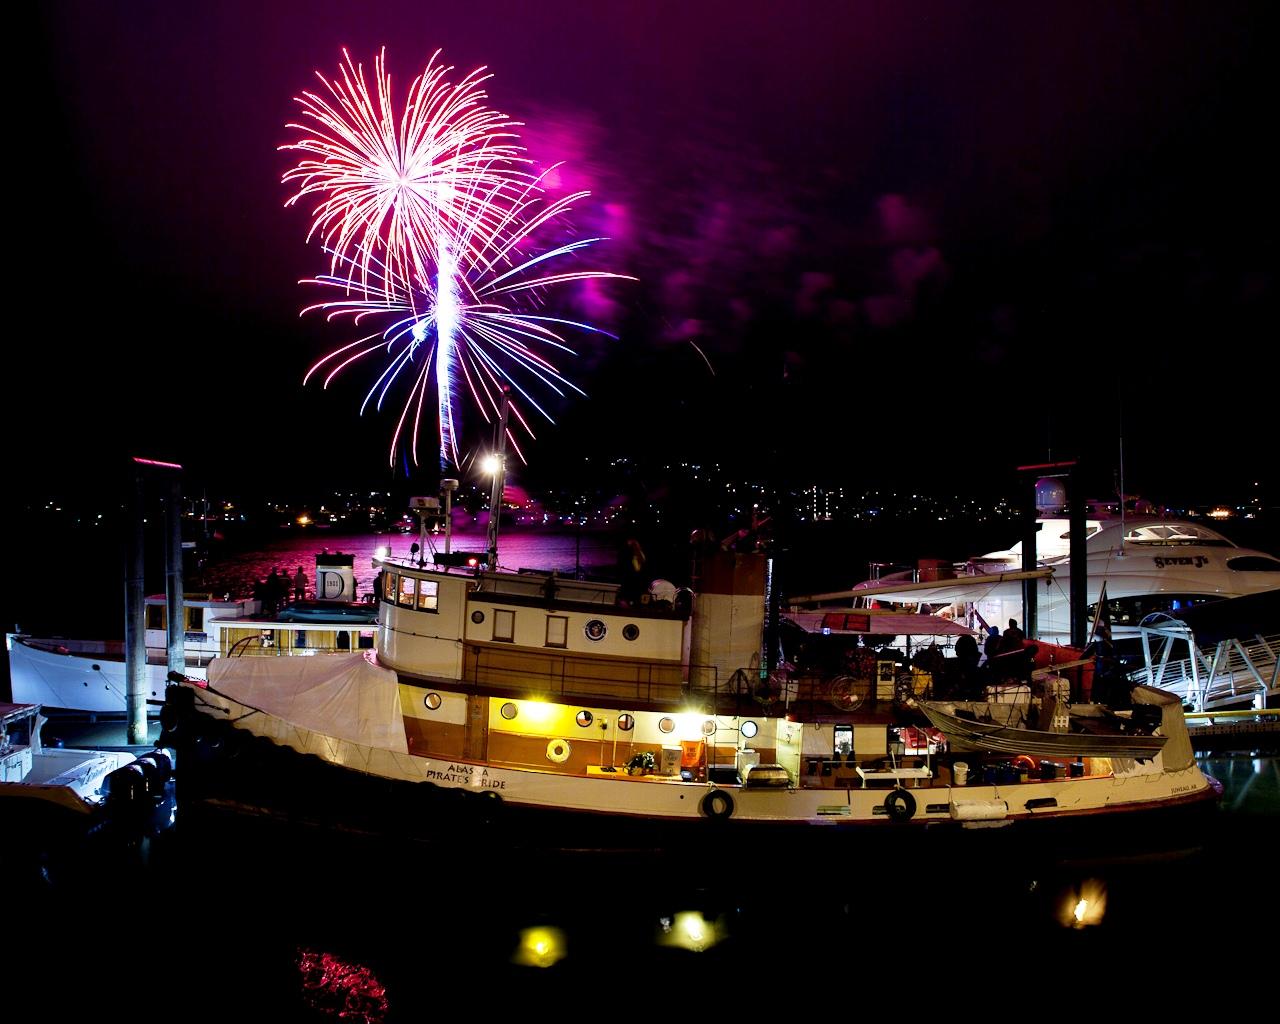 Alaska Pirates Pride (APP) - At night with fireworks